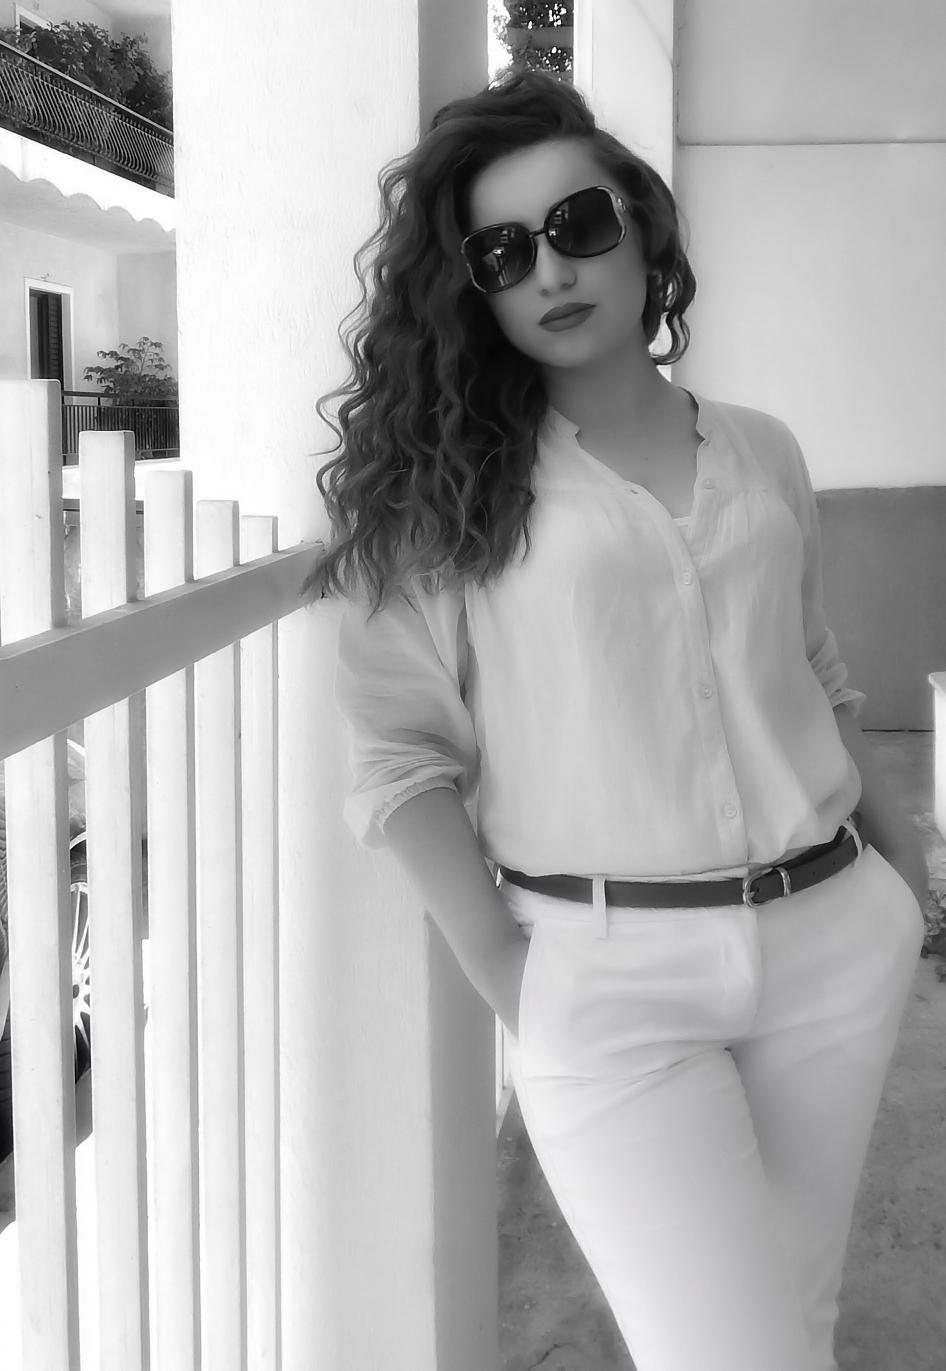 lorena_stroka_instagram_facebook_biografia_albstroka_blog-1